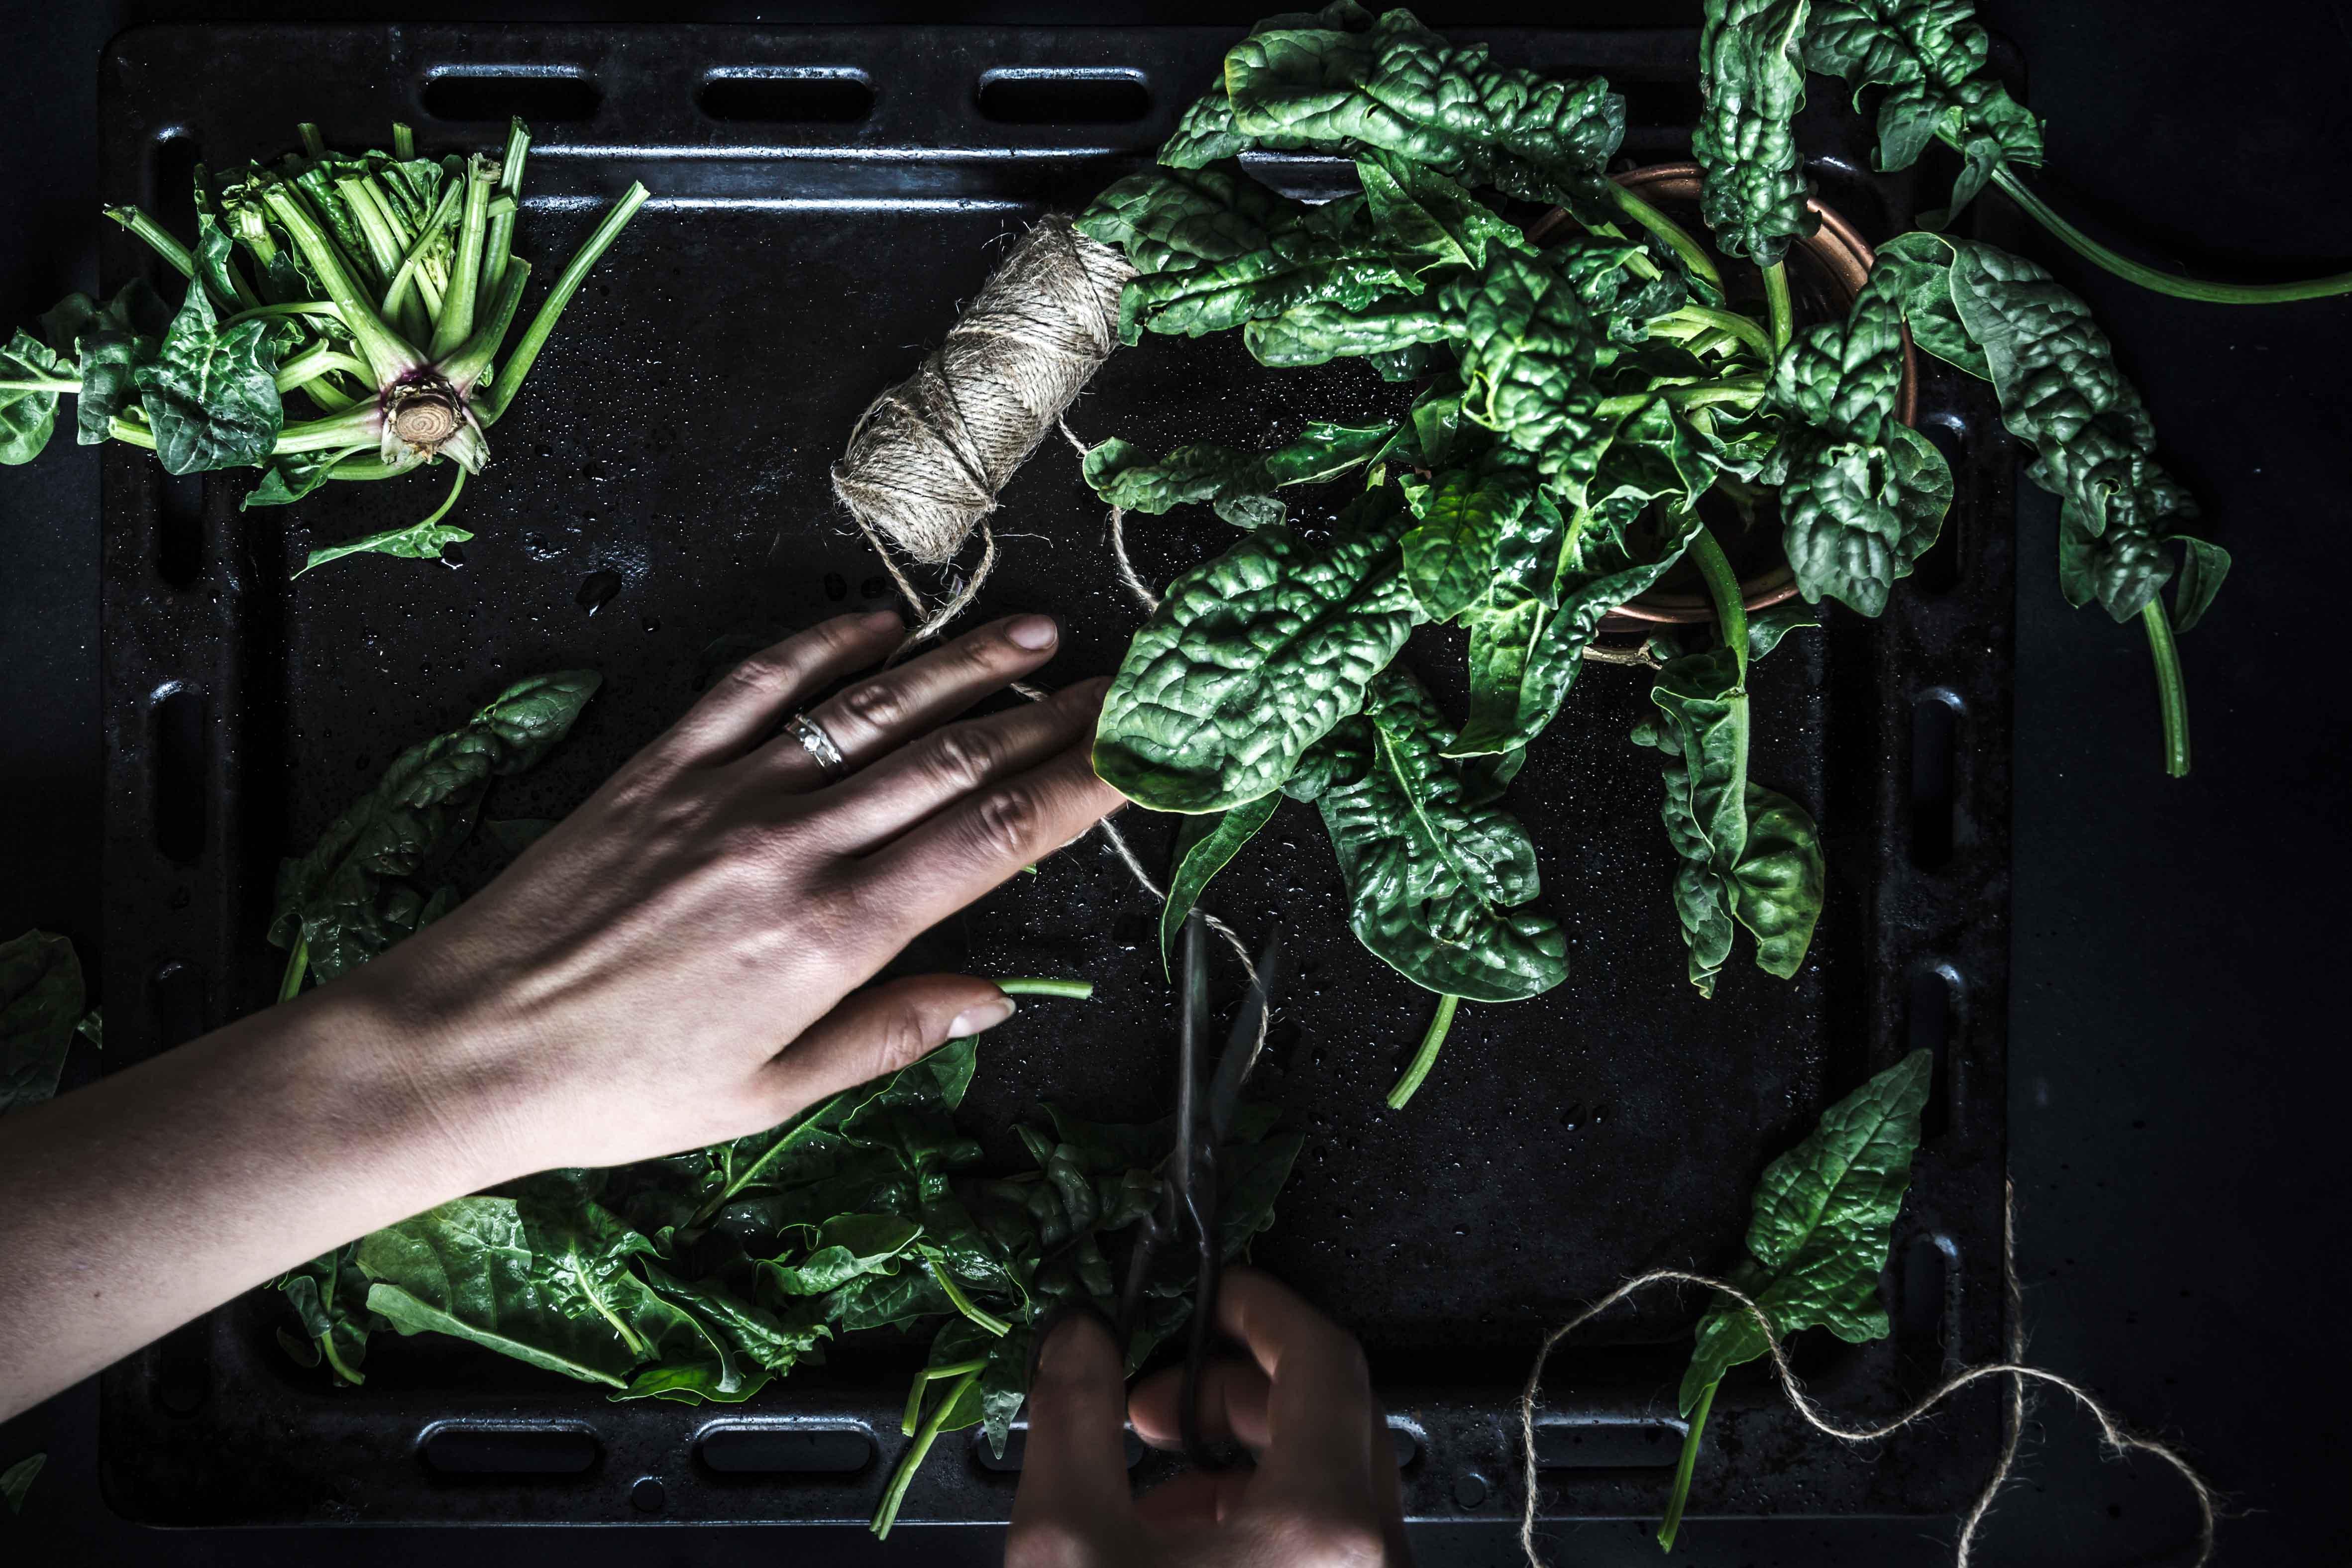 eggless vegan glutenfree spinach tofu quiche recipe - ricetta torta salata spinaci e tofu vegan senza glutine senza uova- spinaci food phptpgraphy